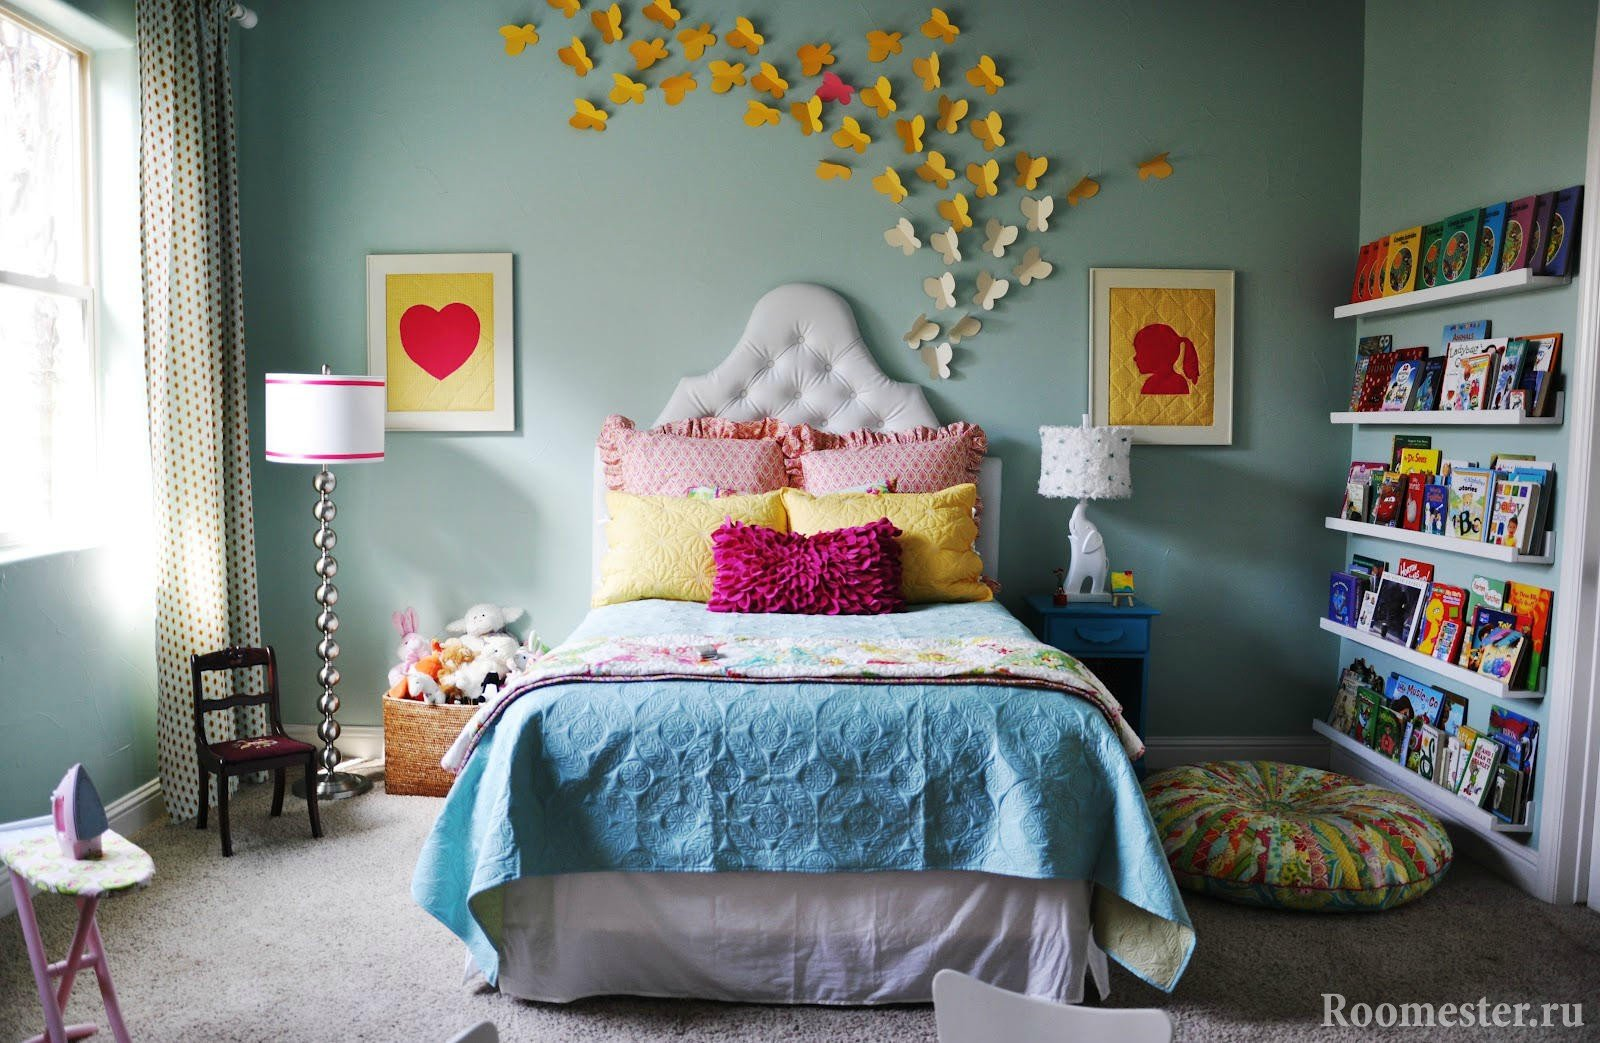 Декор стены бабочками из картона